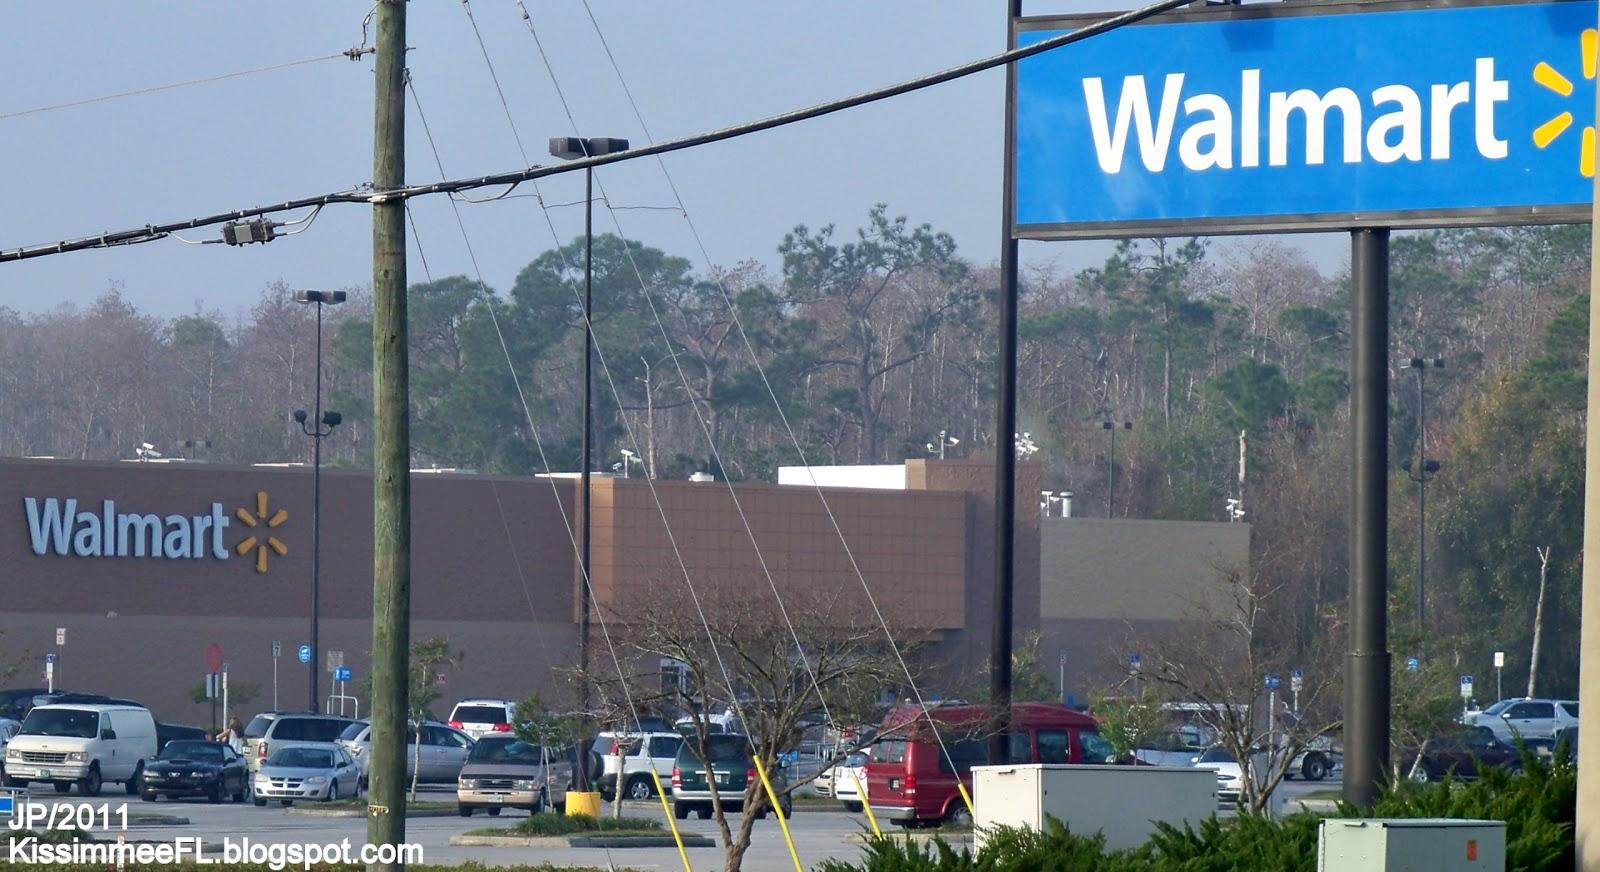 Walmart Fl Images - Reverse Search